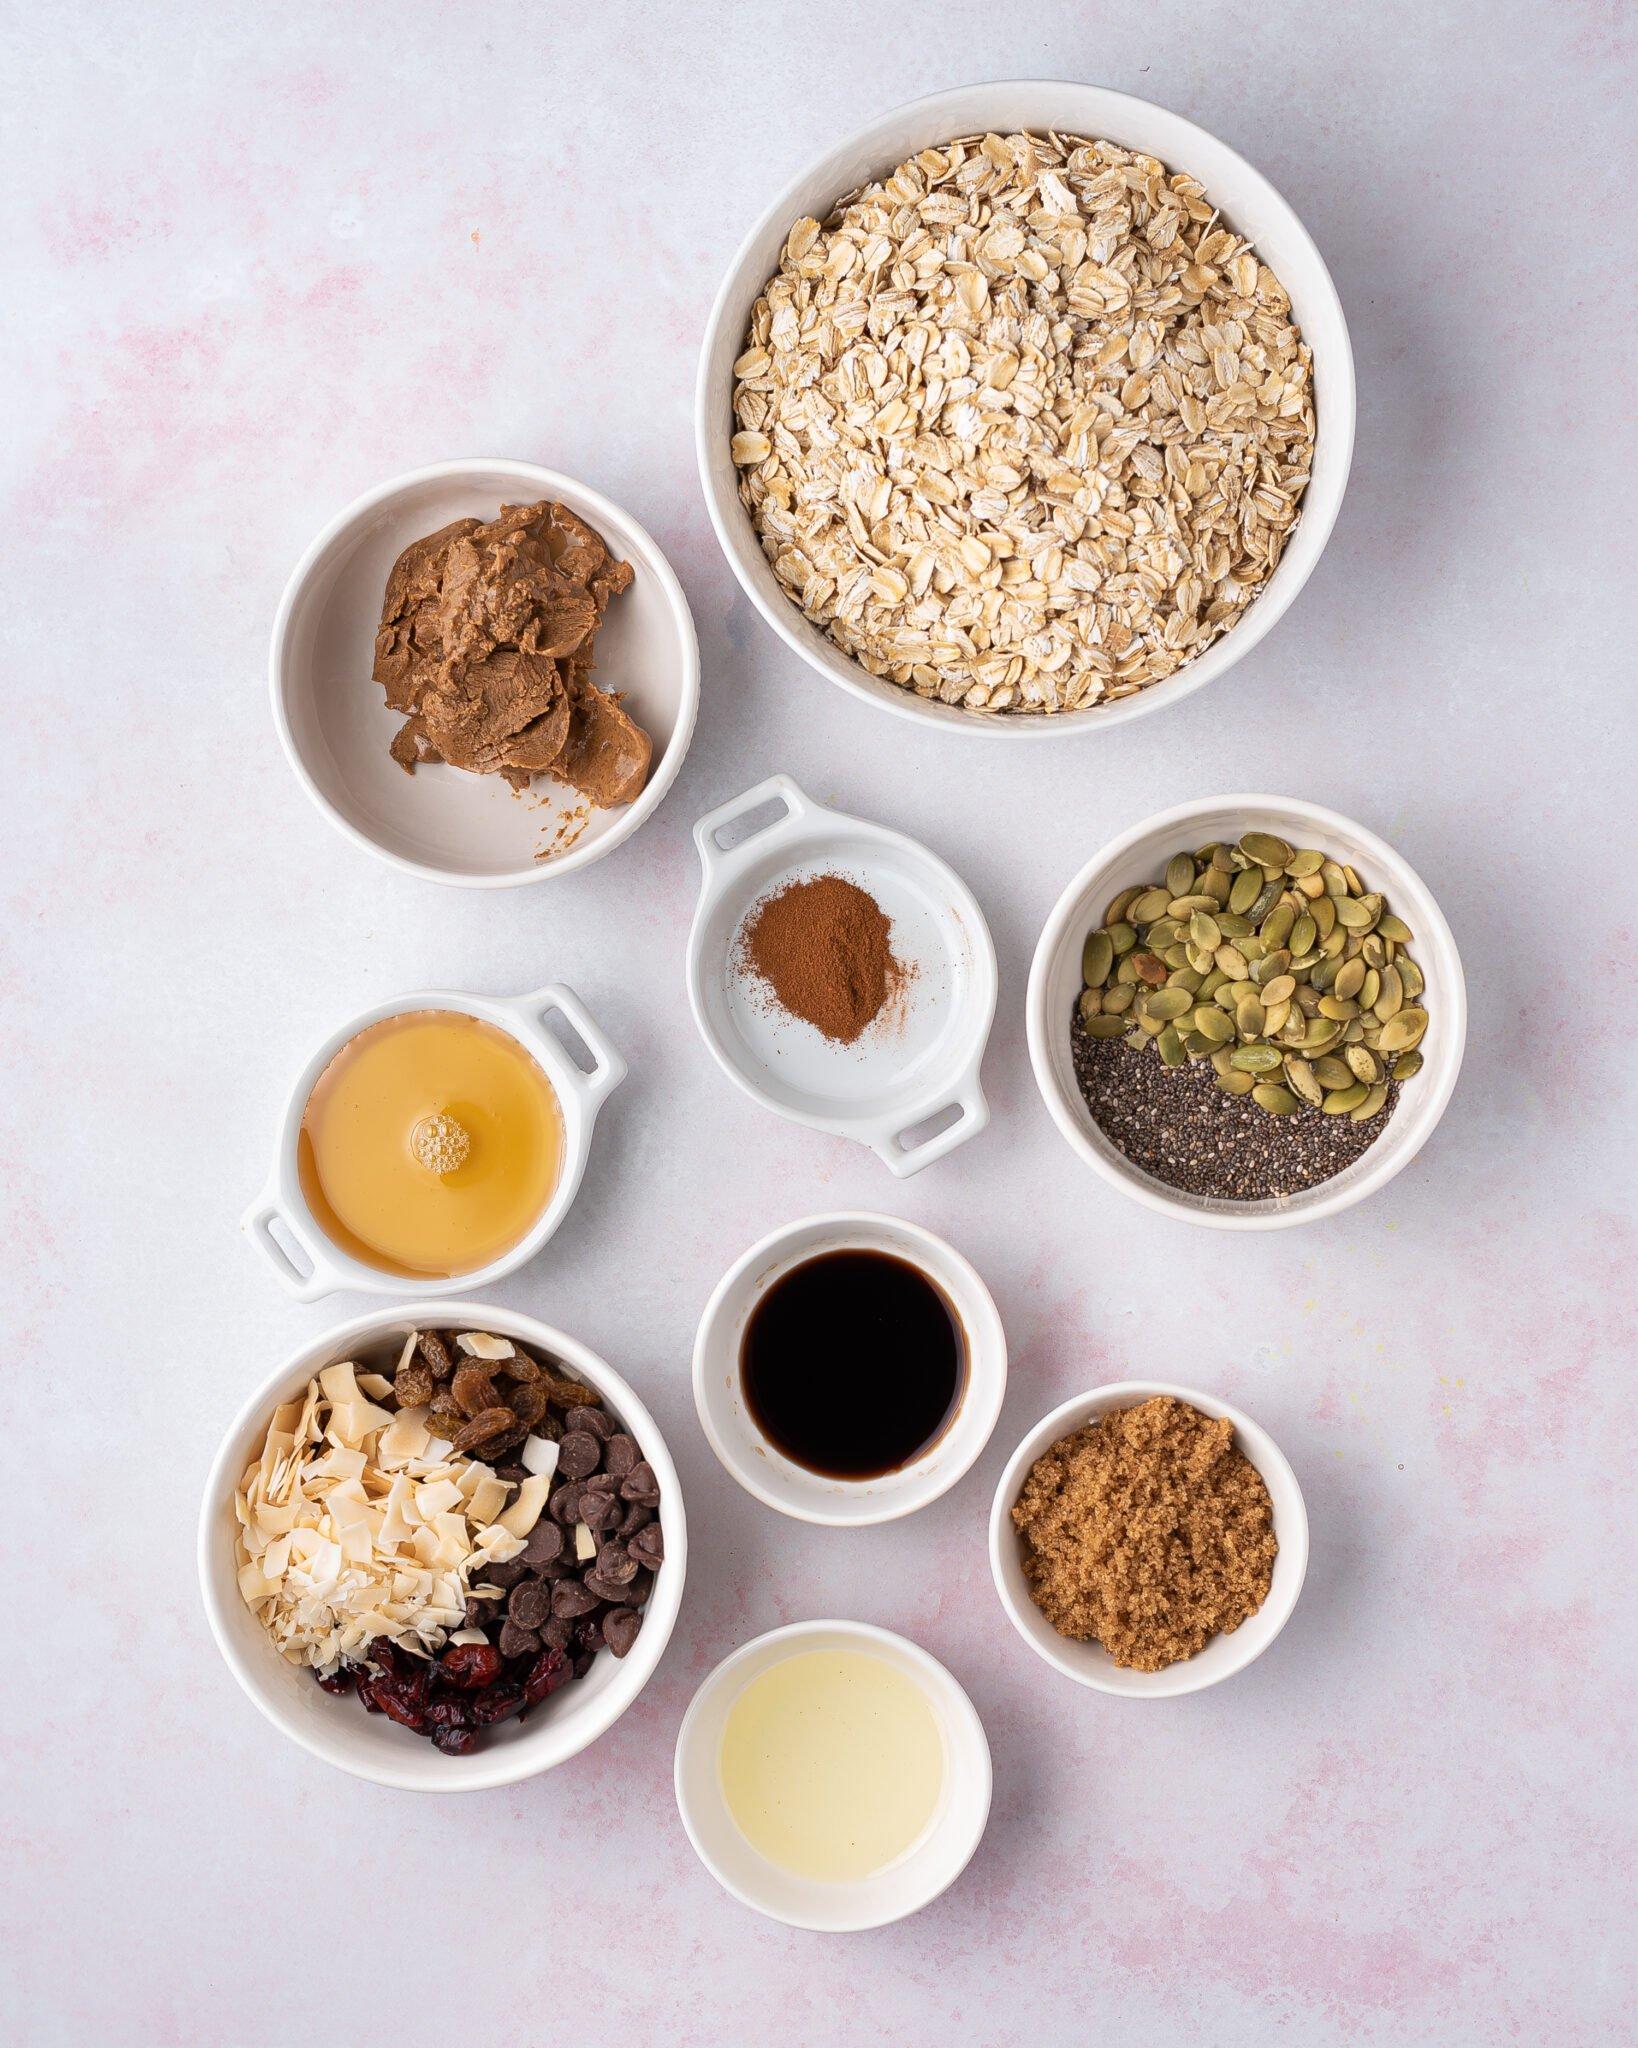 ingredients for Air-Fryer granola